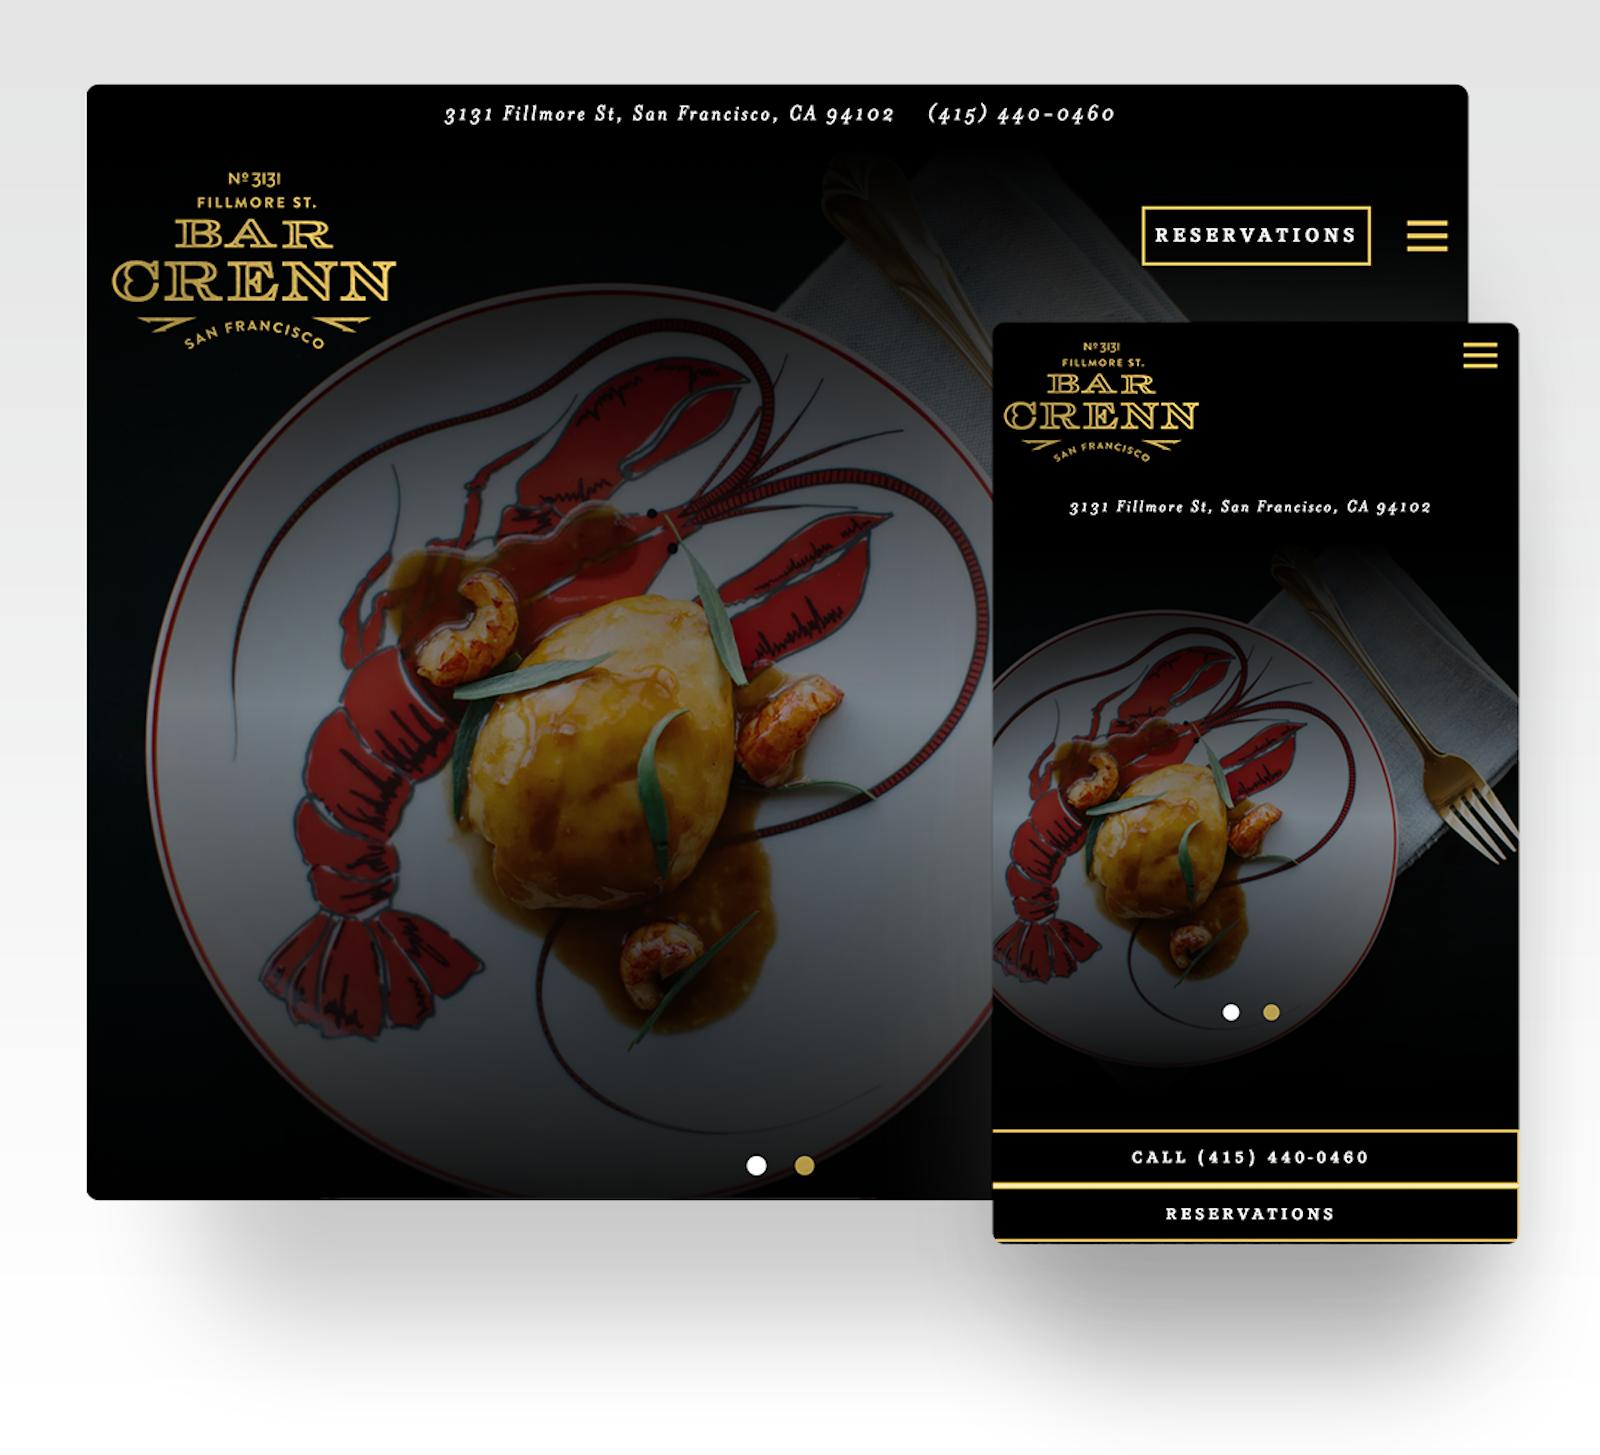 Bar Crenn website